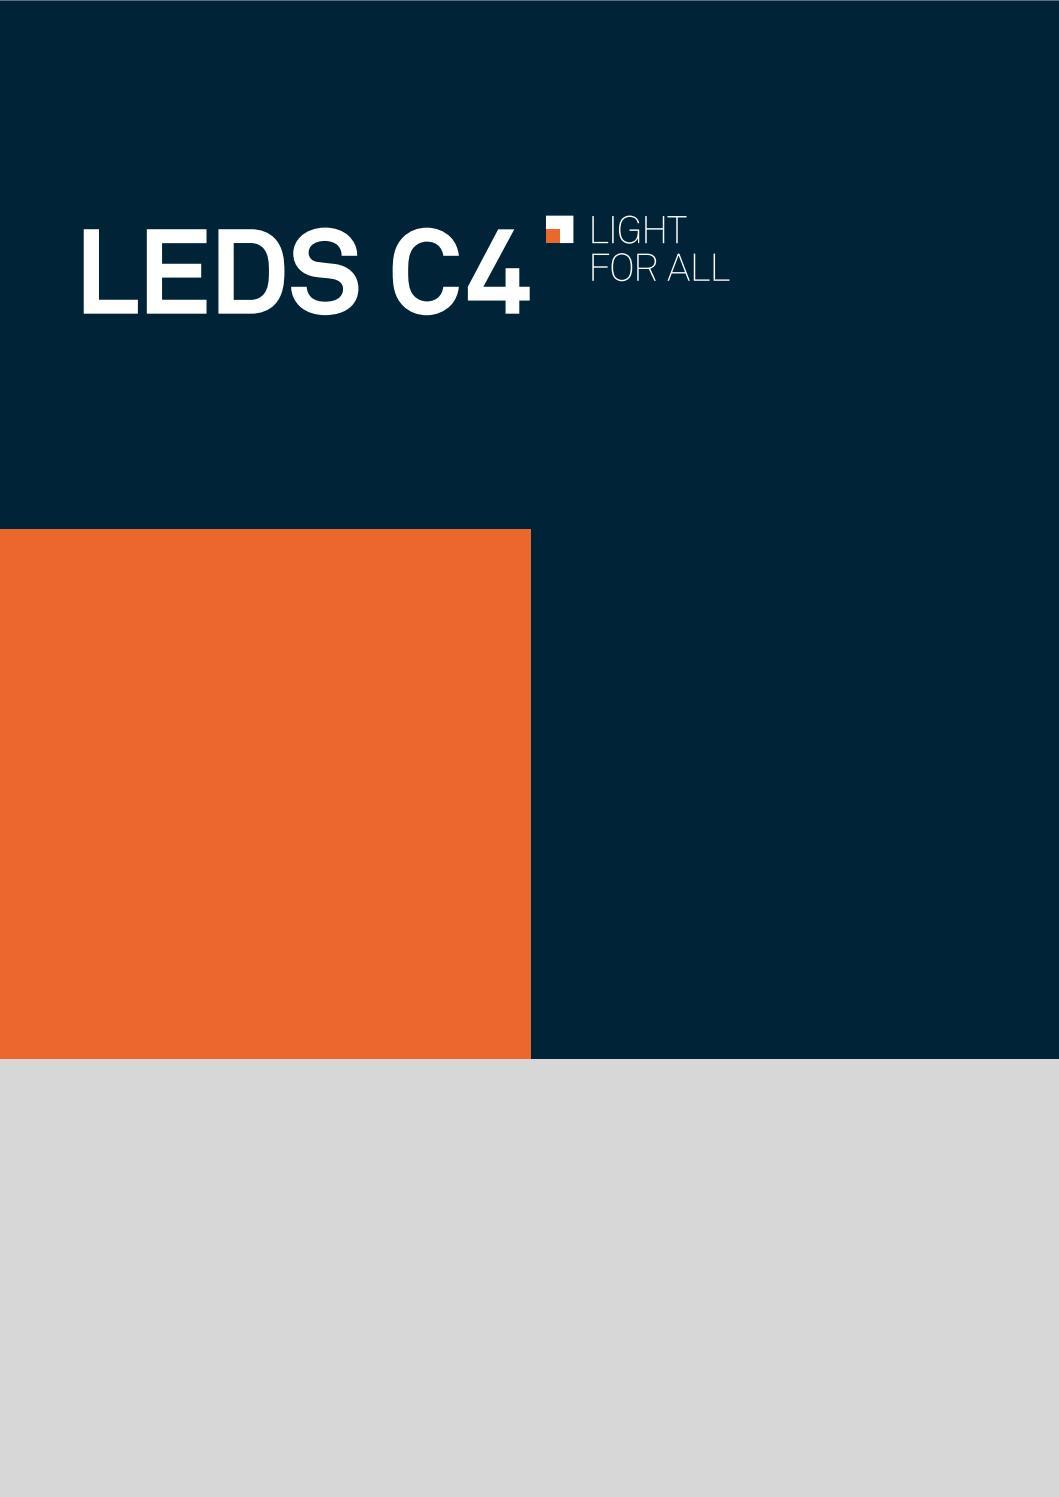 30W LED Chip 900mA 32-34V 2400-2700 LM High Power kalt weiss